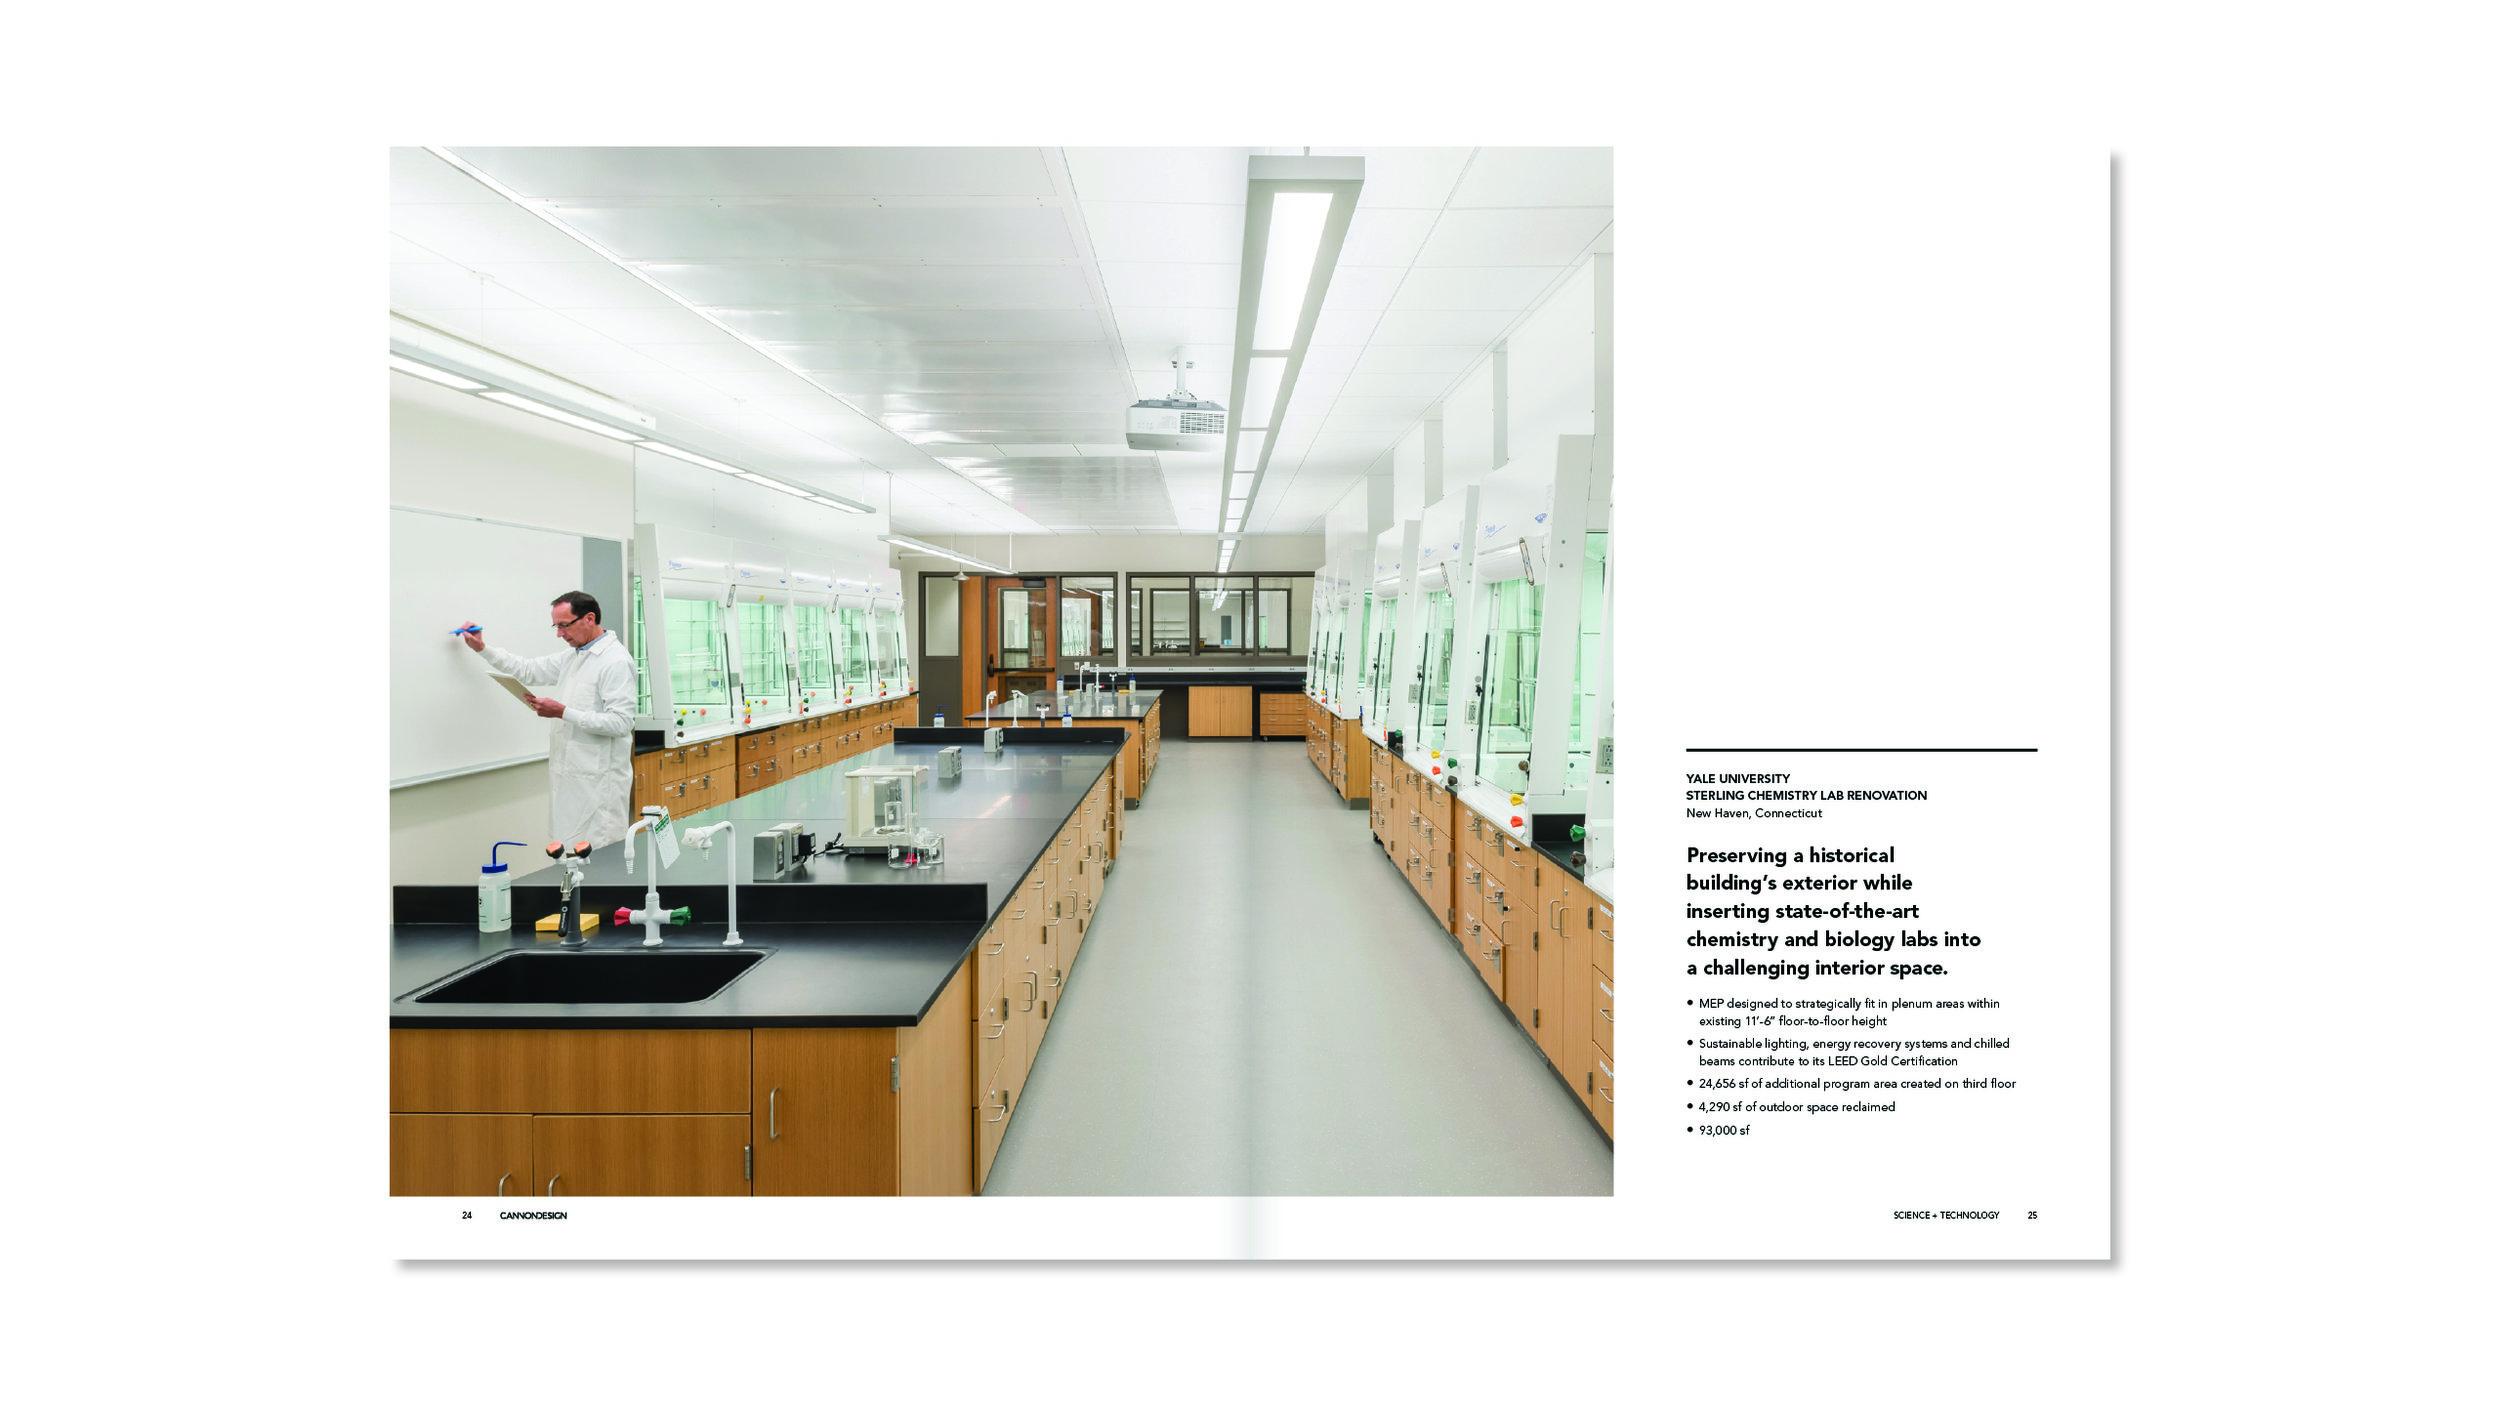 ScienceTechnology14.jpg